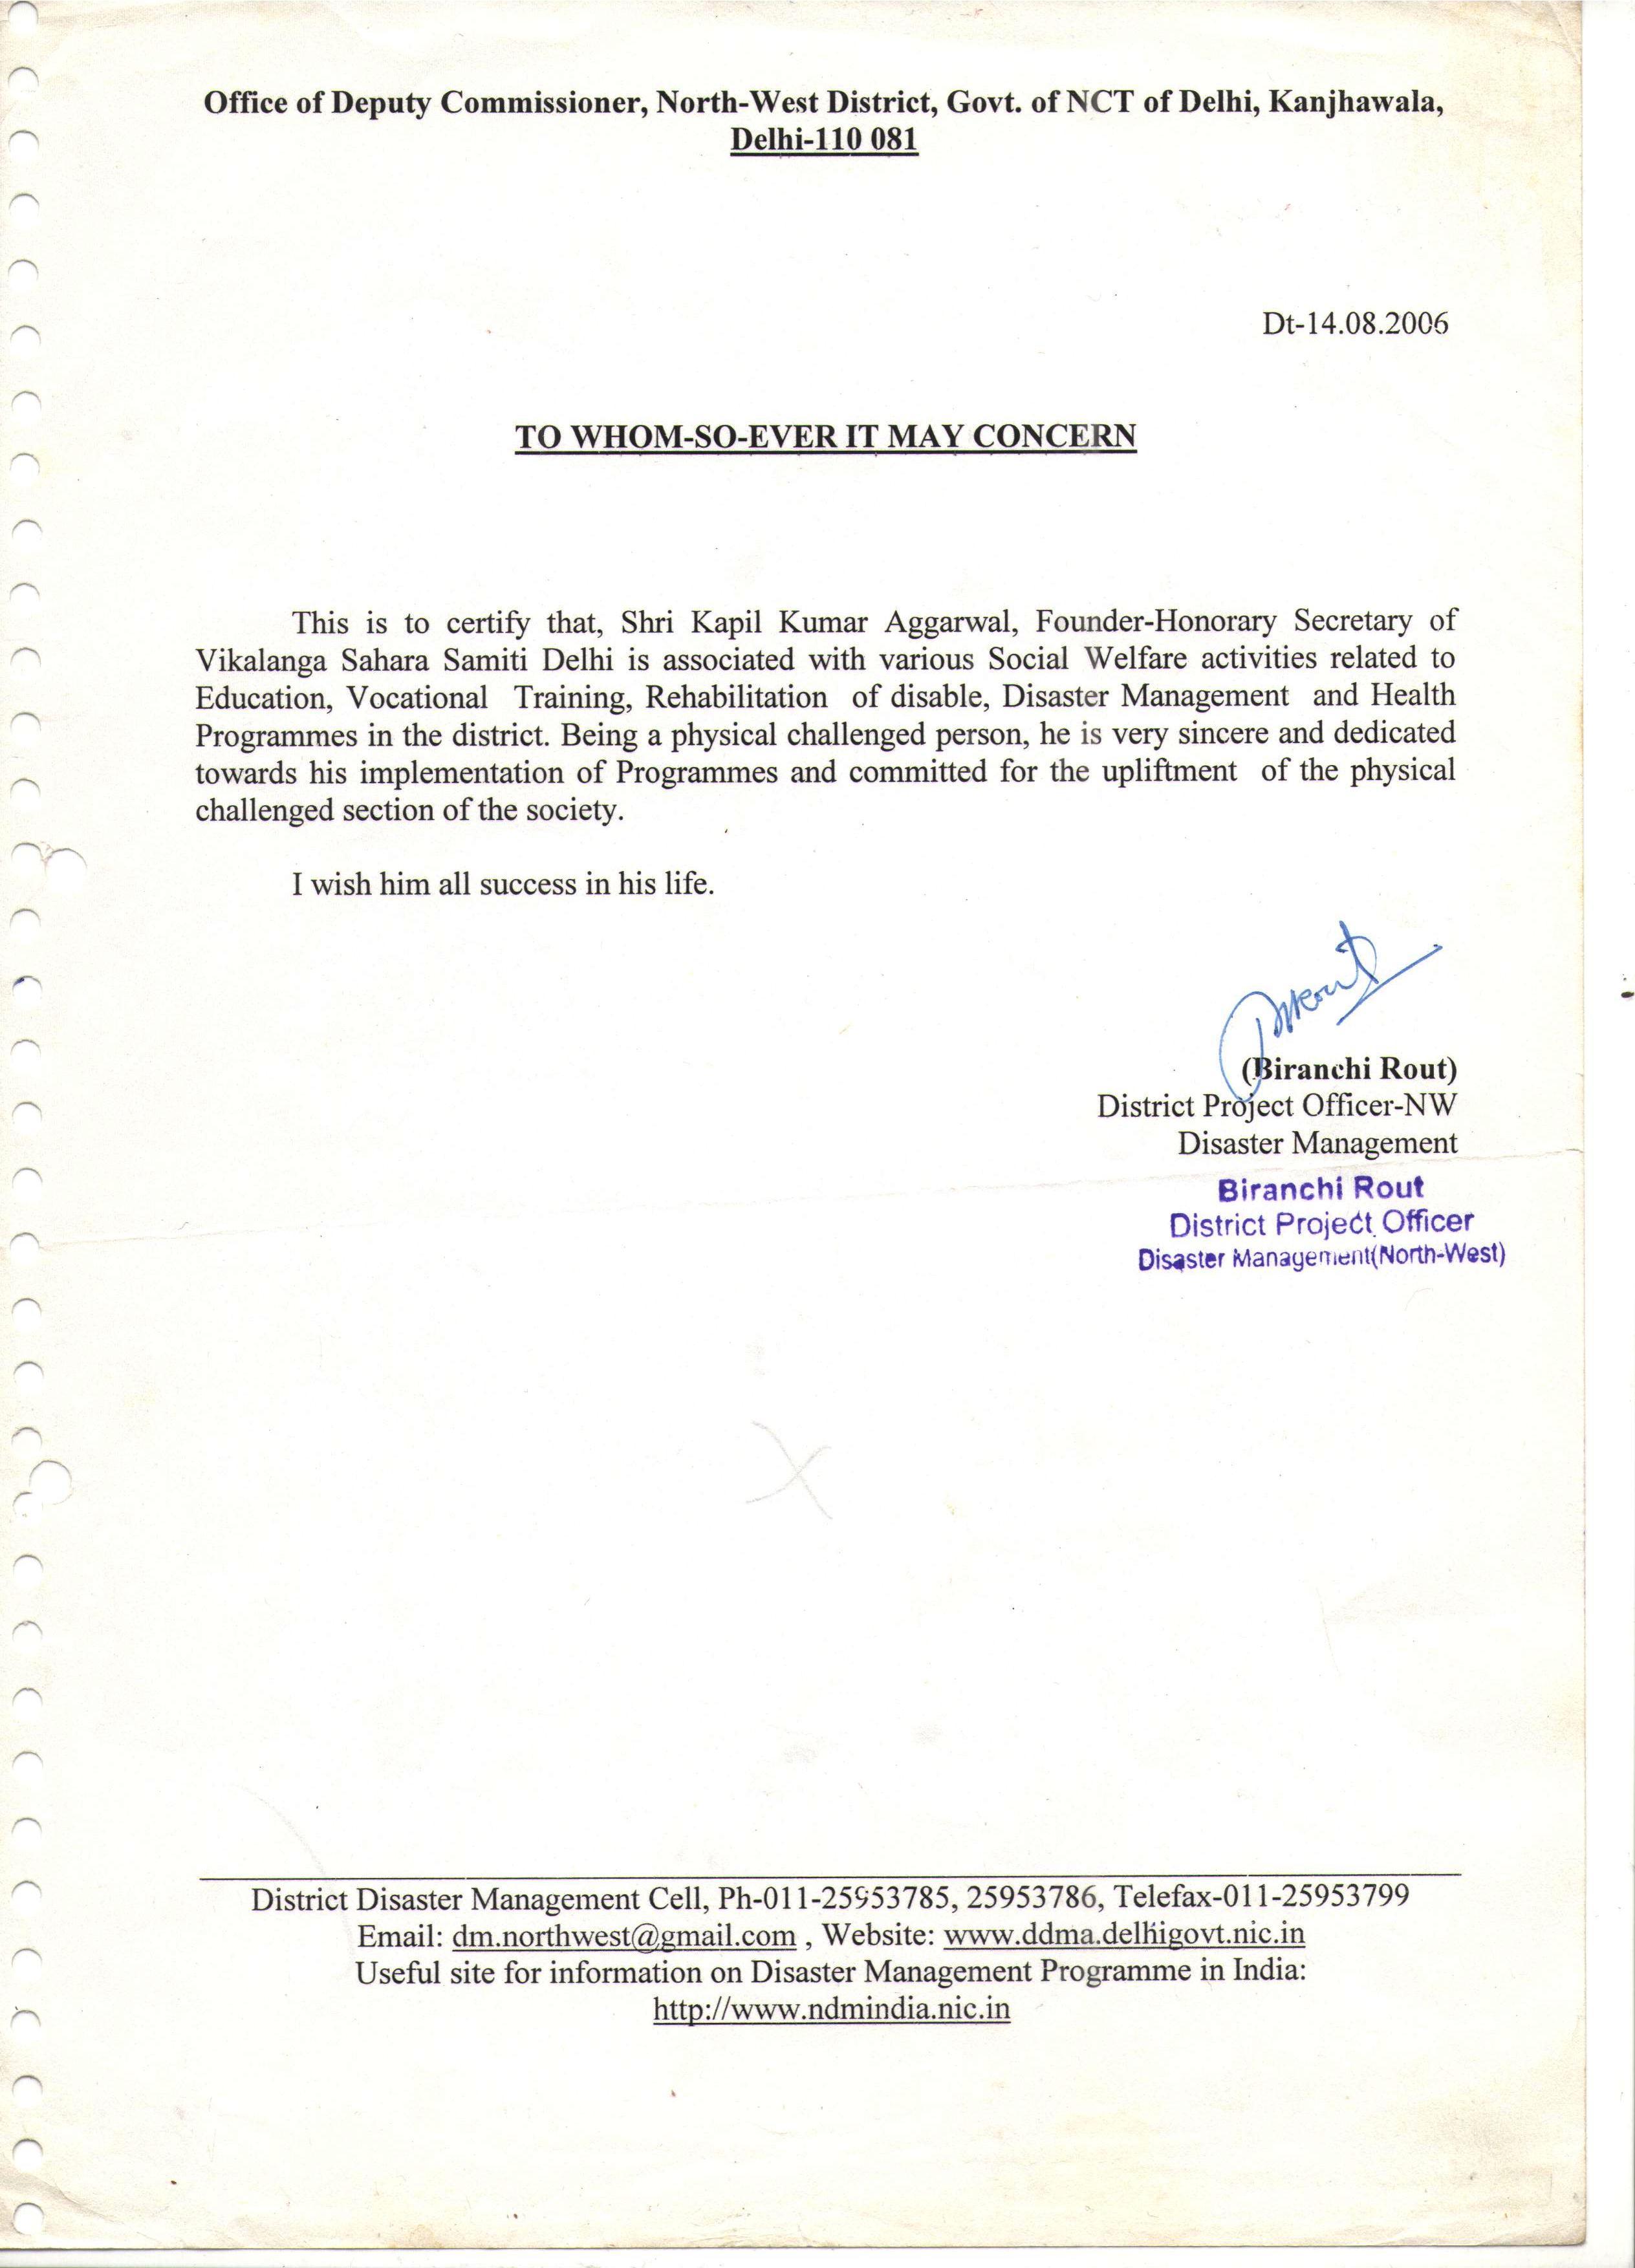 Awards to Our General Secretary – Viklang Sahara Samiti